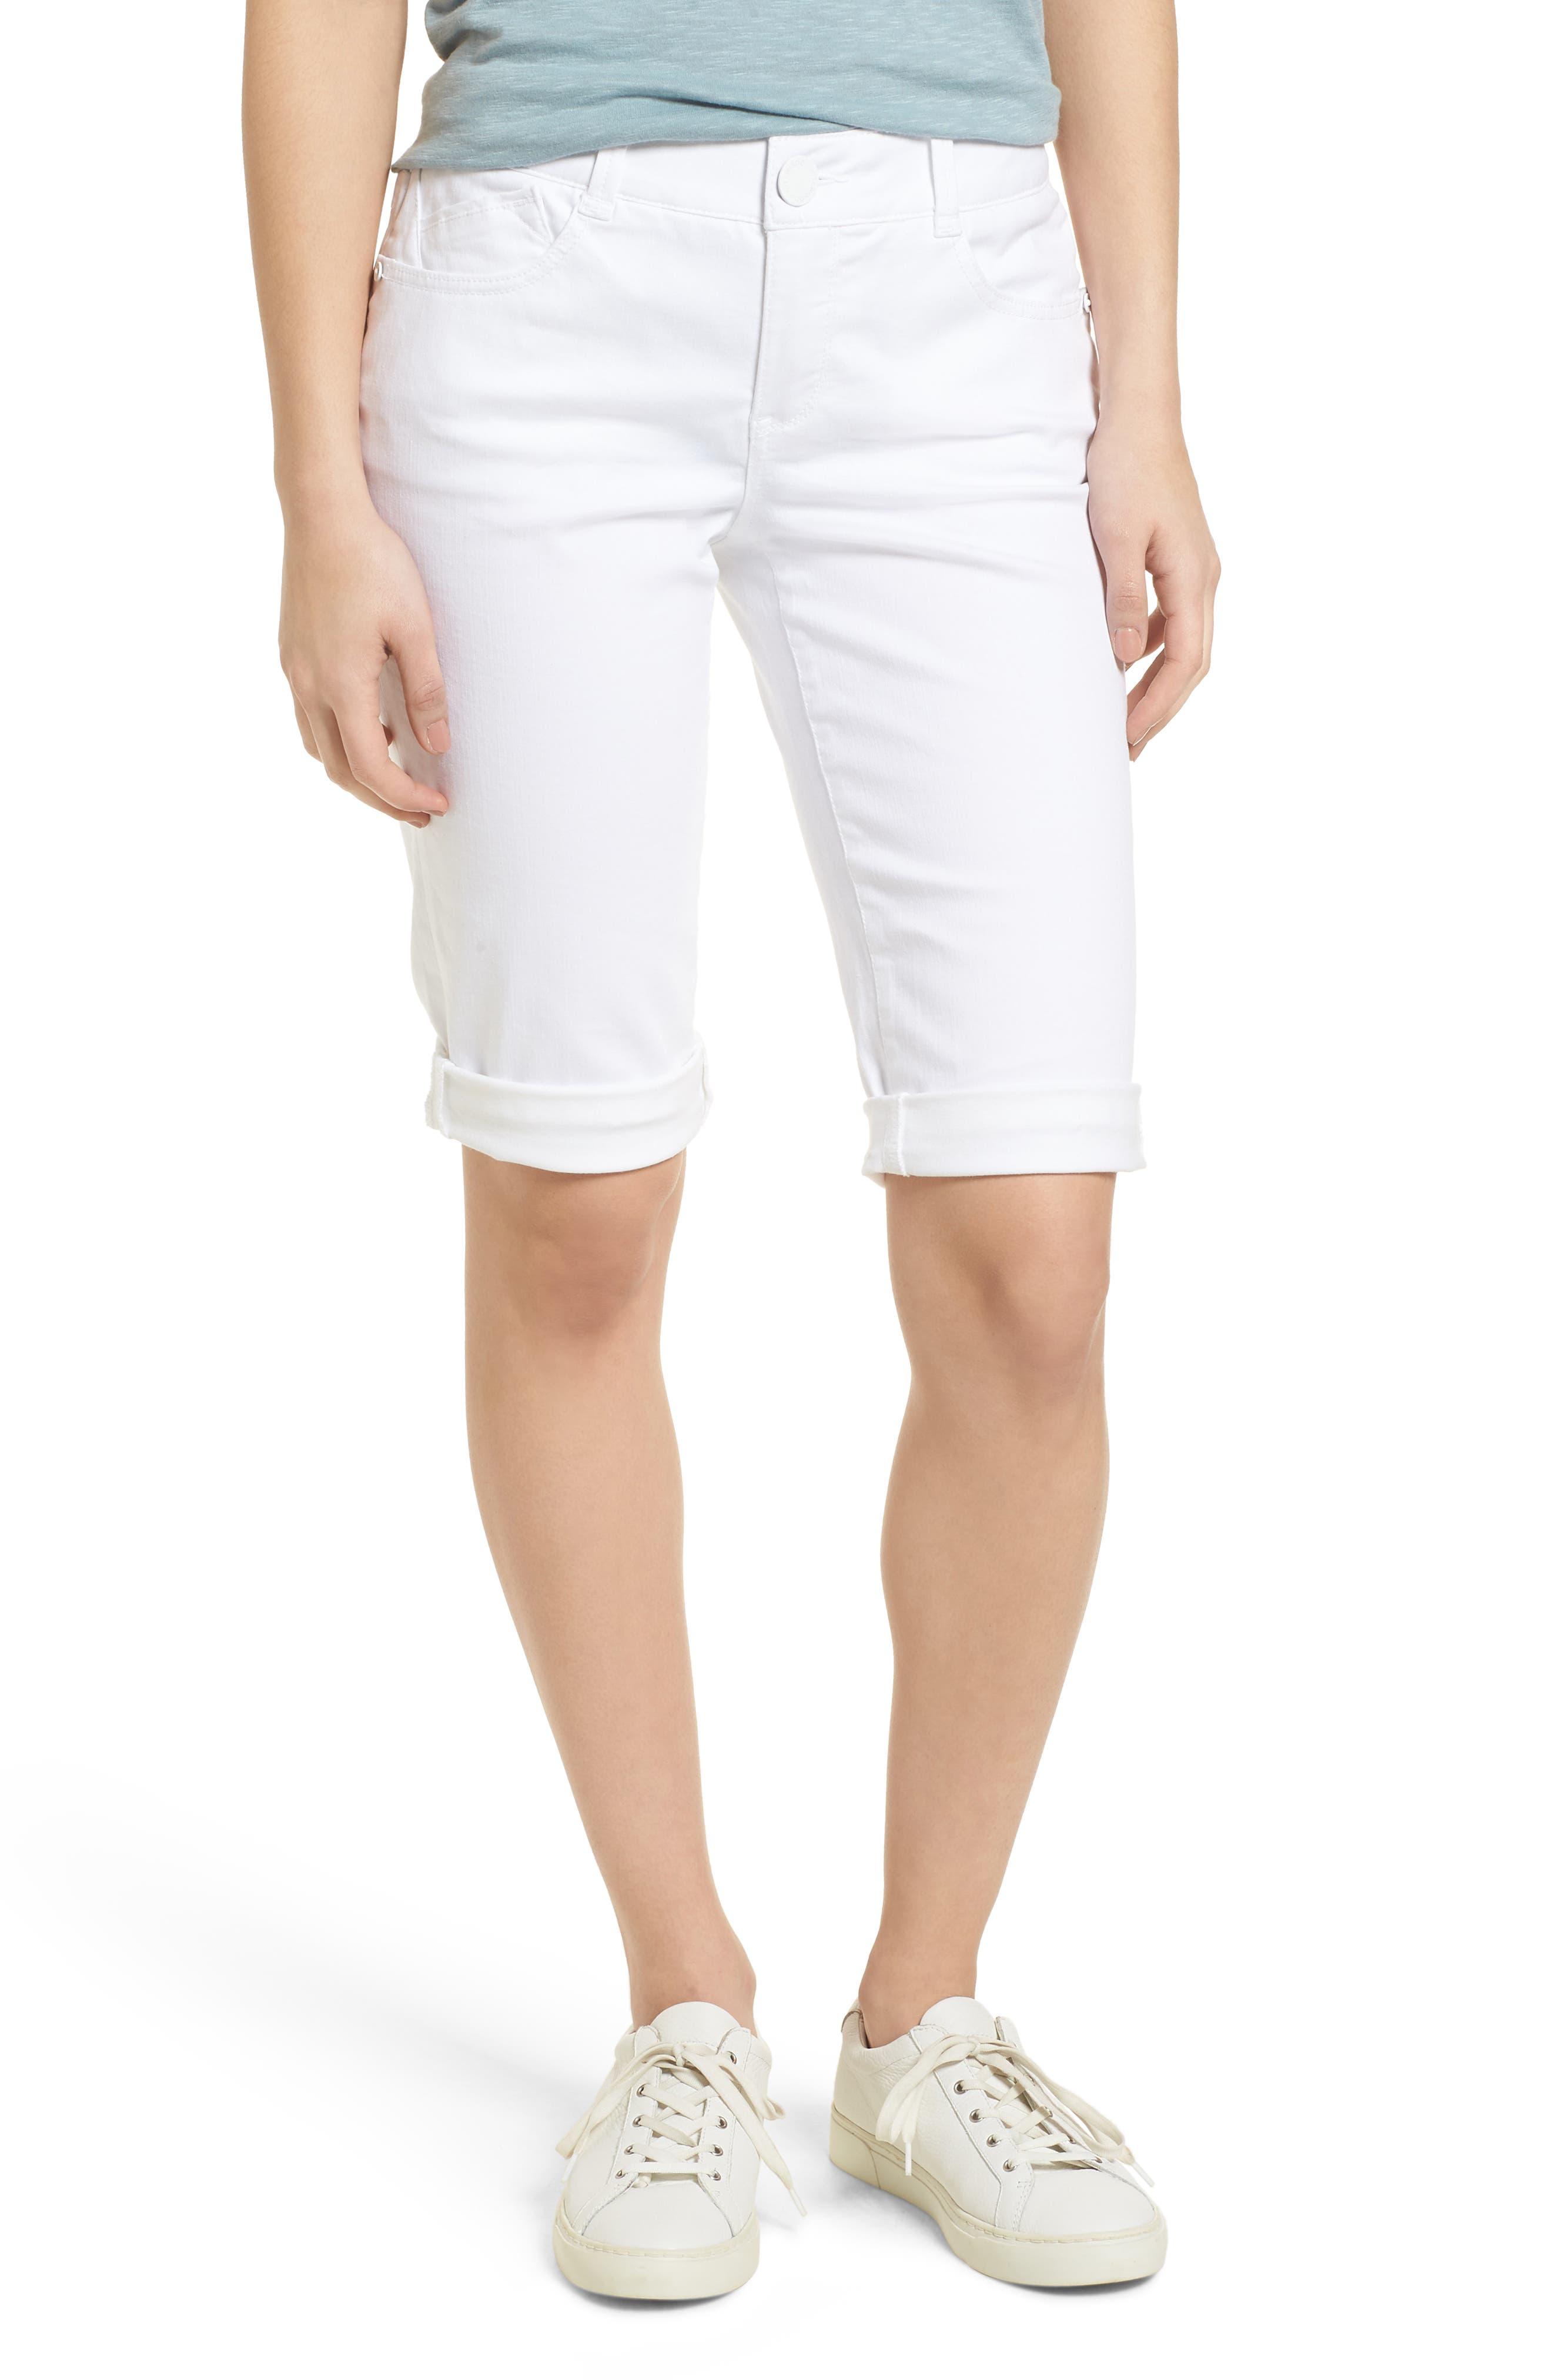 Ab-solution White Bermuda Shorts,                         Main,                         color, OPTIC WHITE